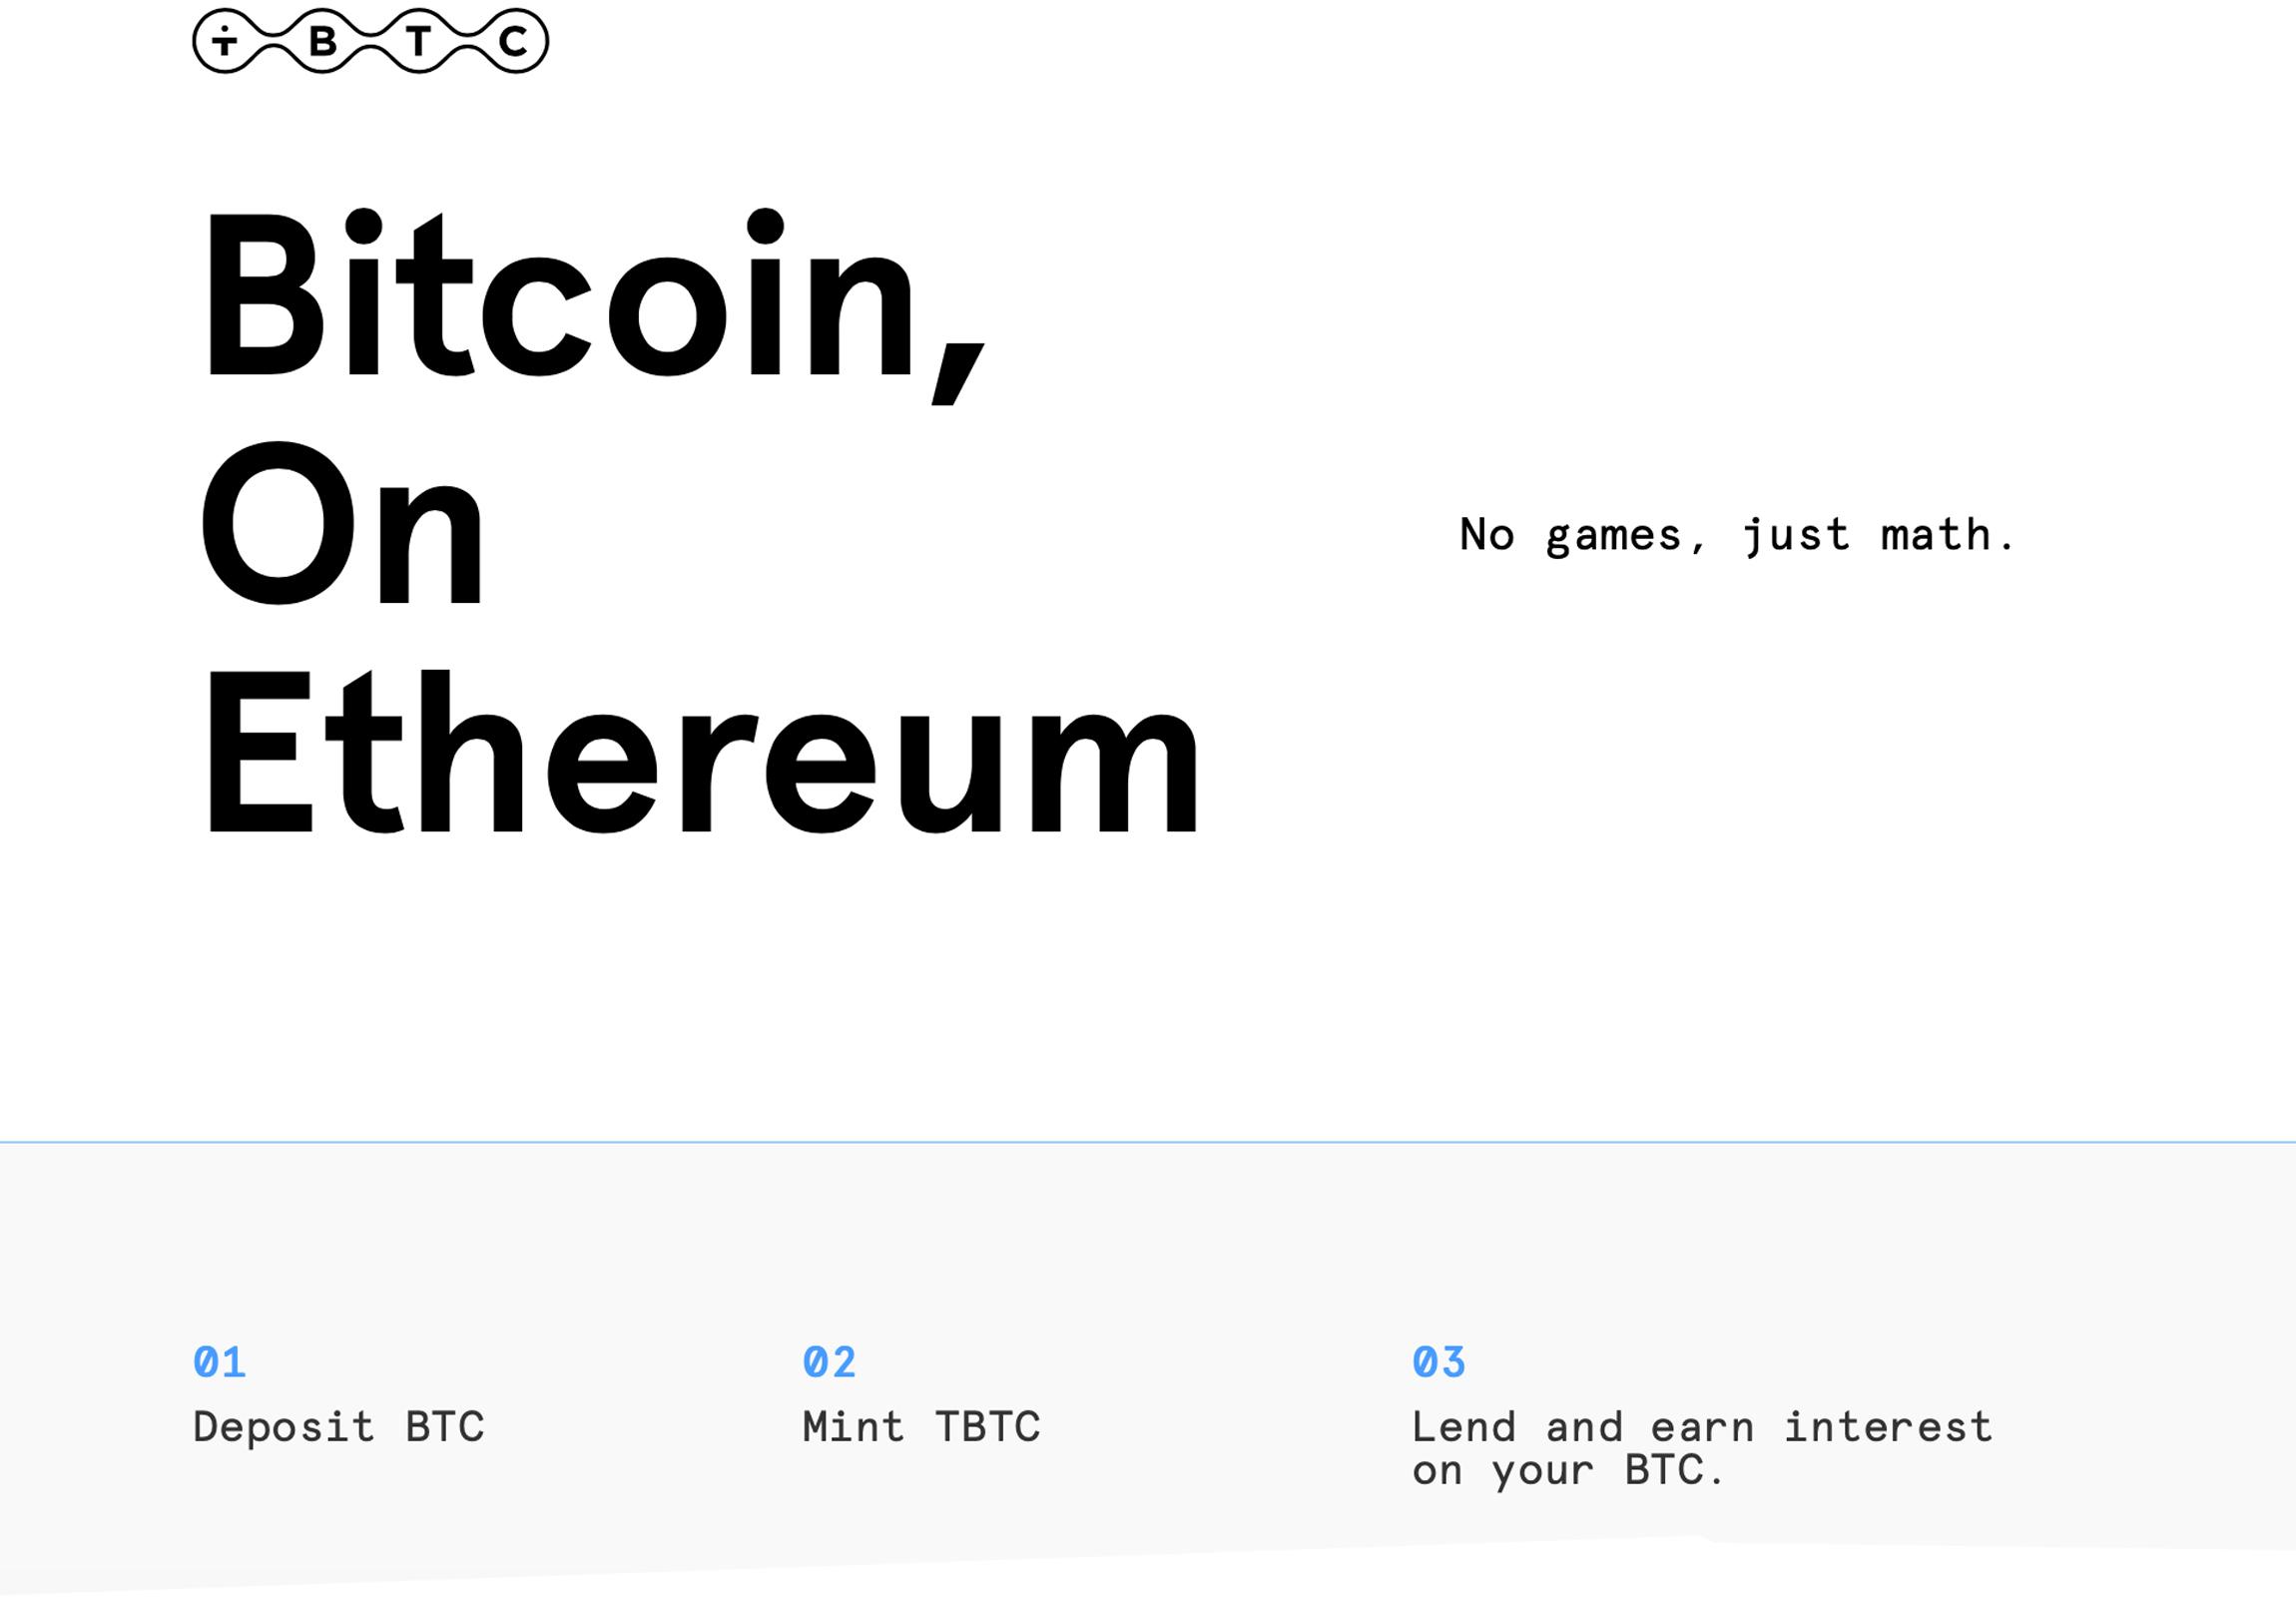 Defi for Bitcoin: Collateral Peg Platform Provides Noncustodial BTC Lending on Ethereum